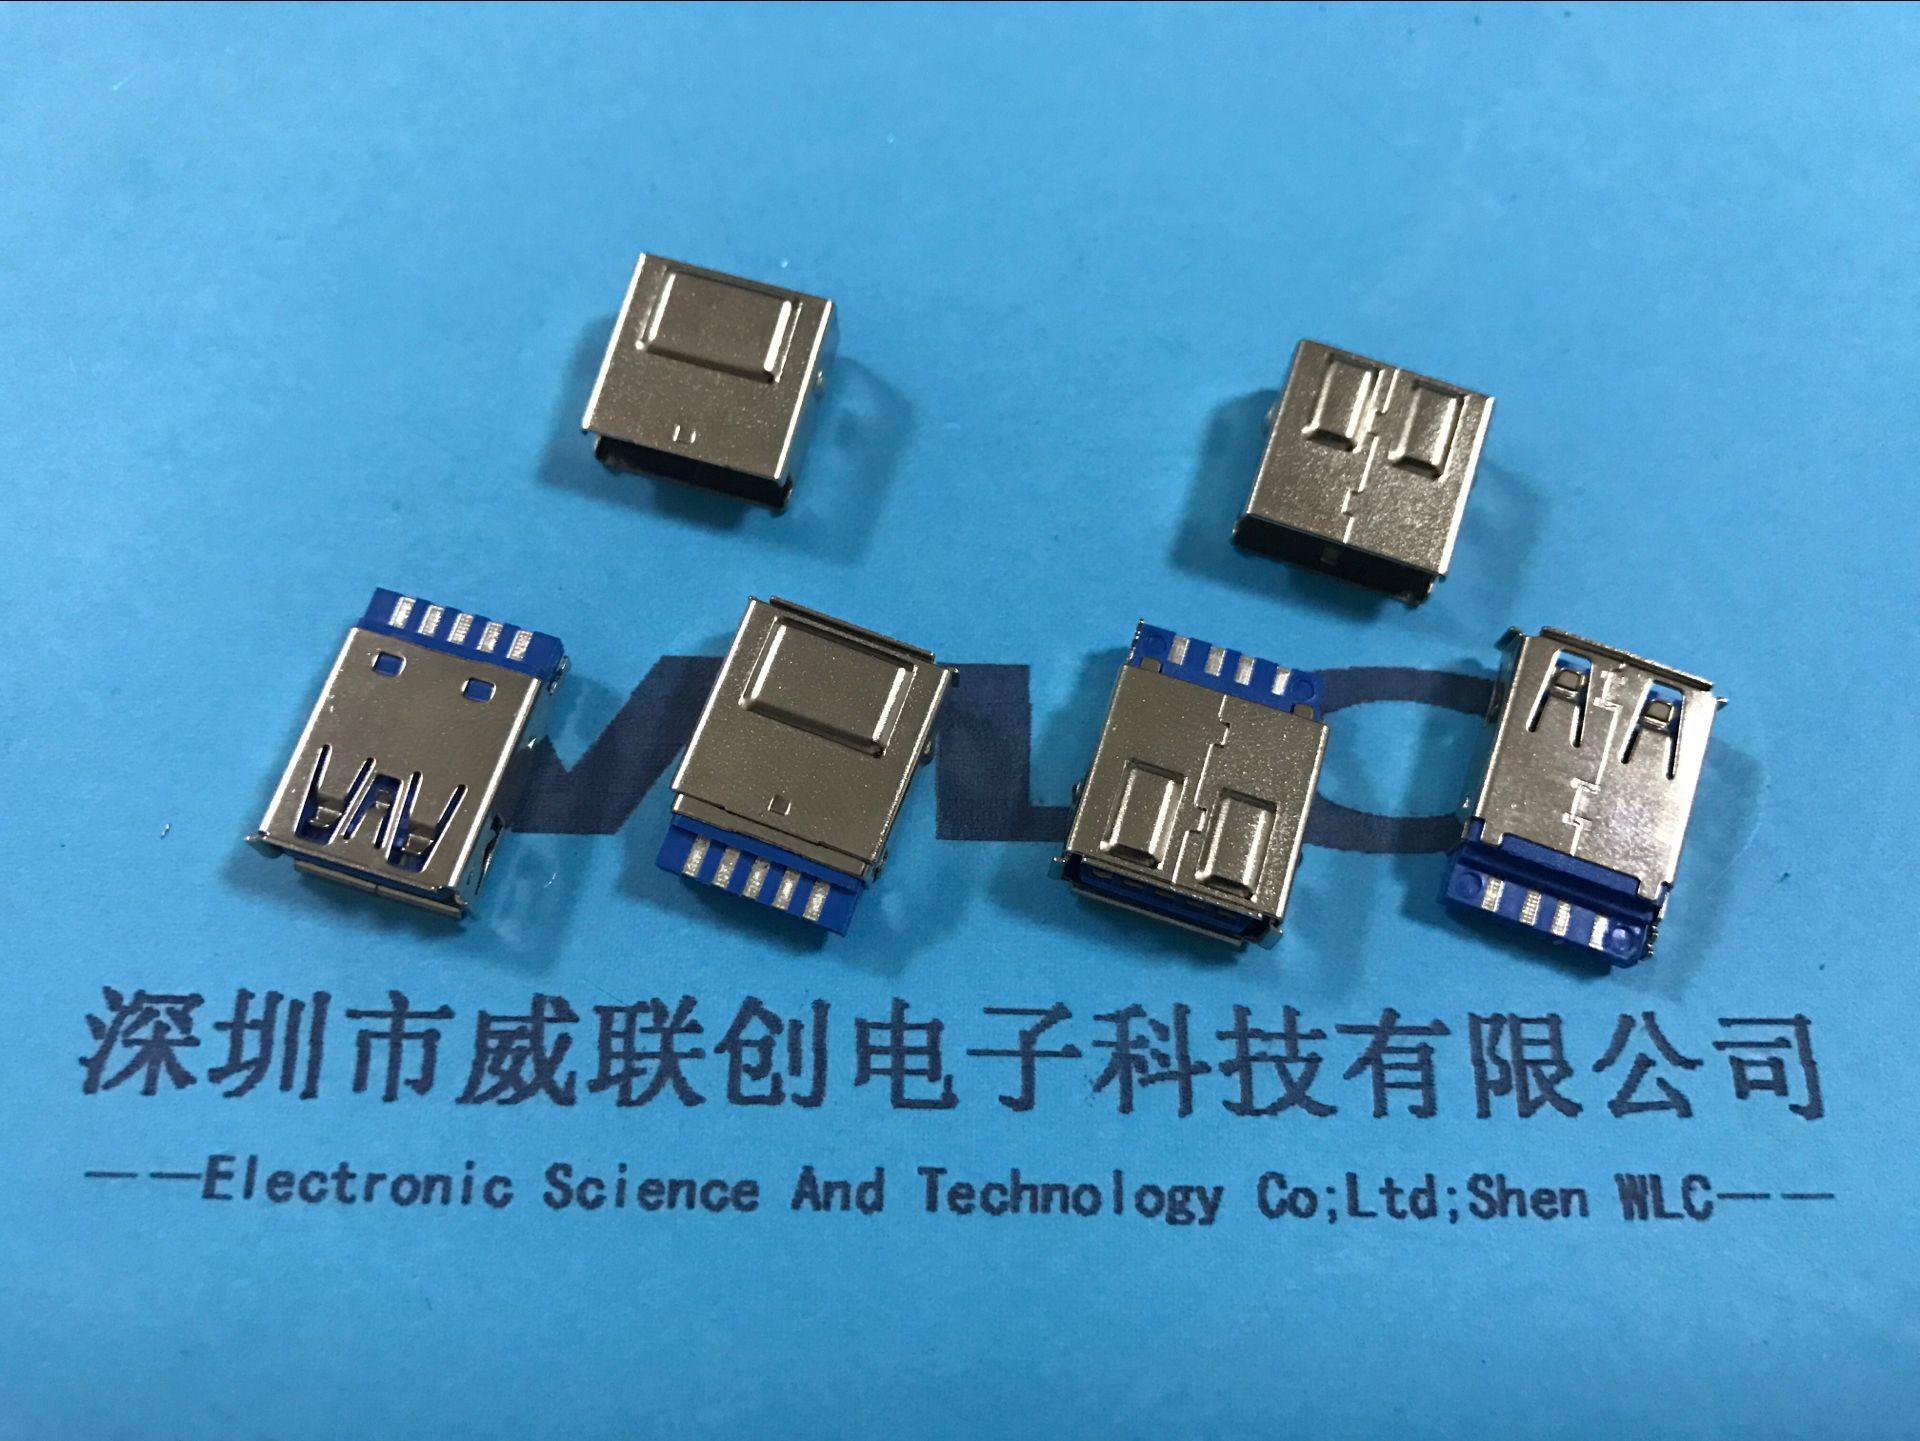 威联创直插USB母座 3.0/2.0 弯脚卷边AF 13.7mm示例图1